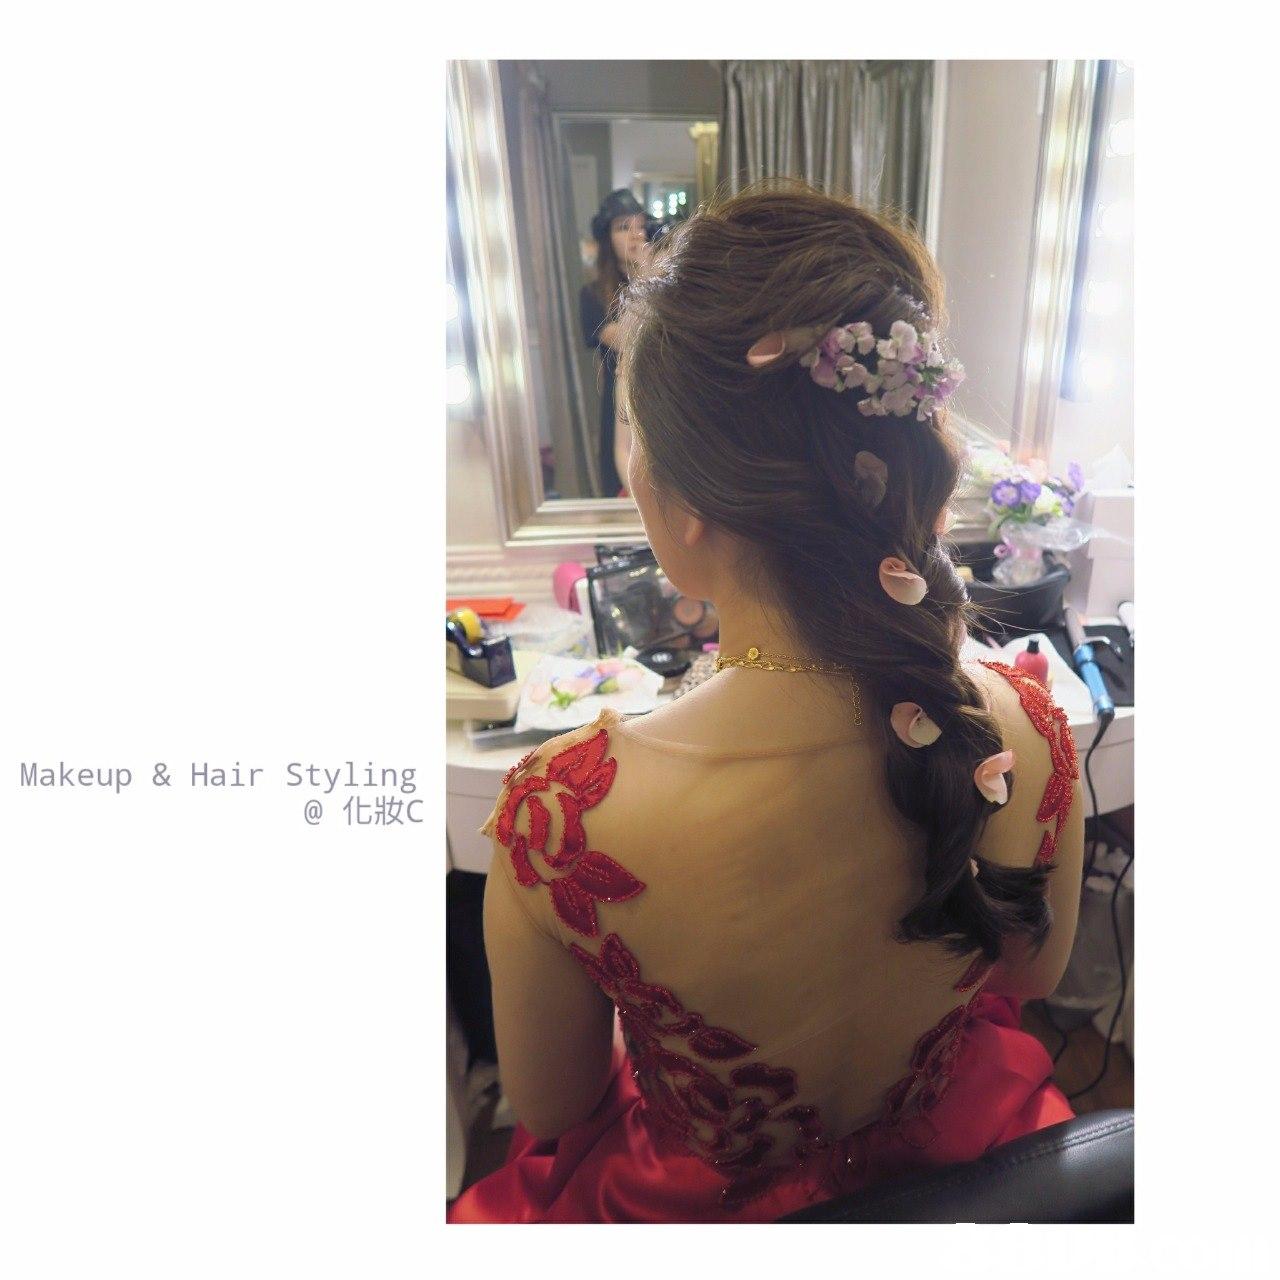 Makeup & Hair Styling @化妝c,hair,hairstyle,shoulder,neck,long hair